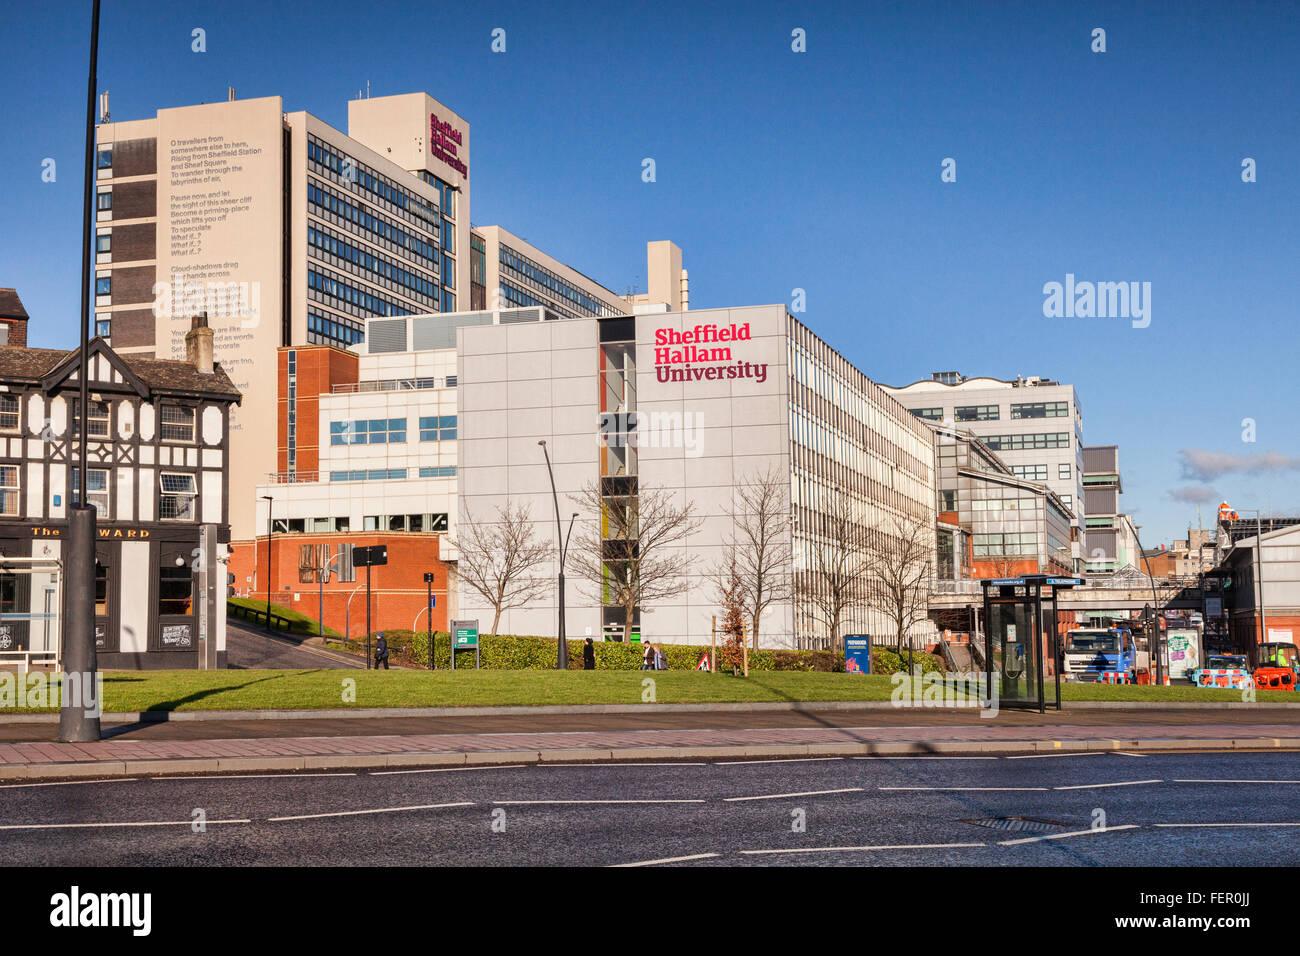 Sheffield Hallam University, Sheffield, South Yorkshire, Angleterre, Royaume-Uni Photo Stock